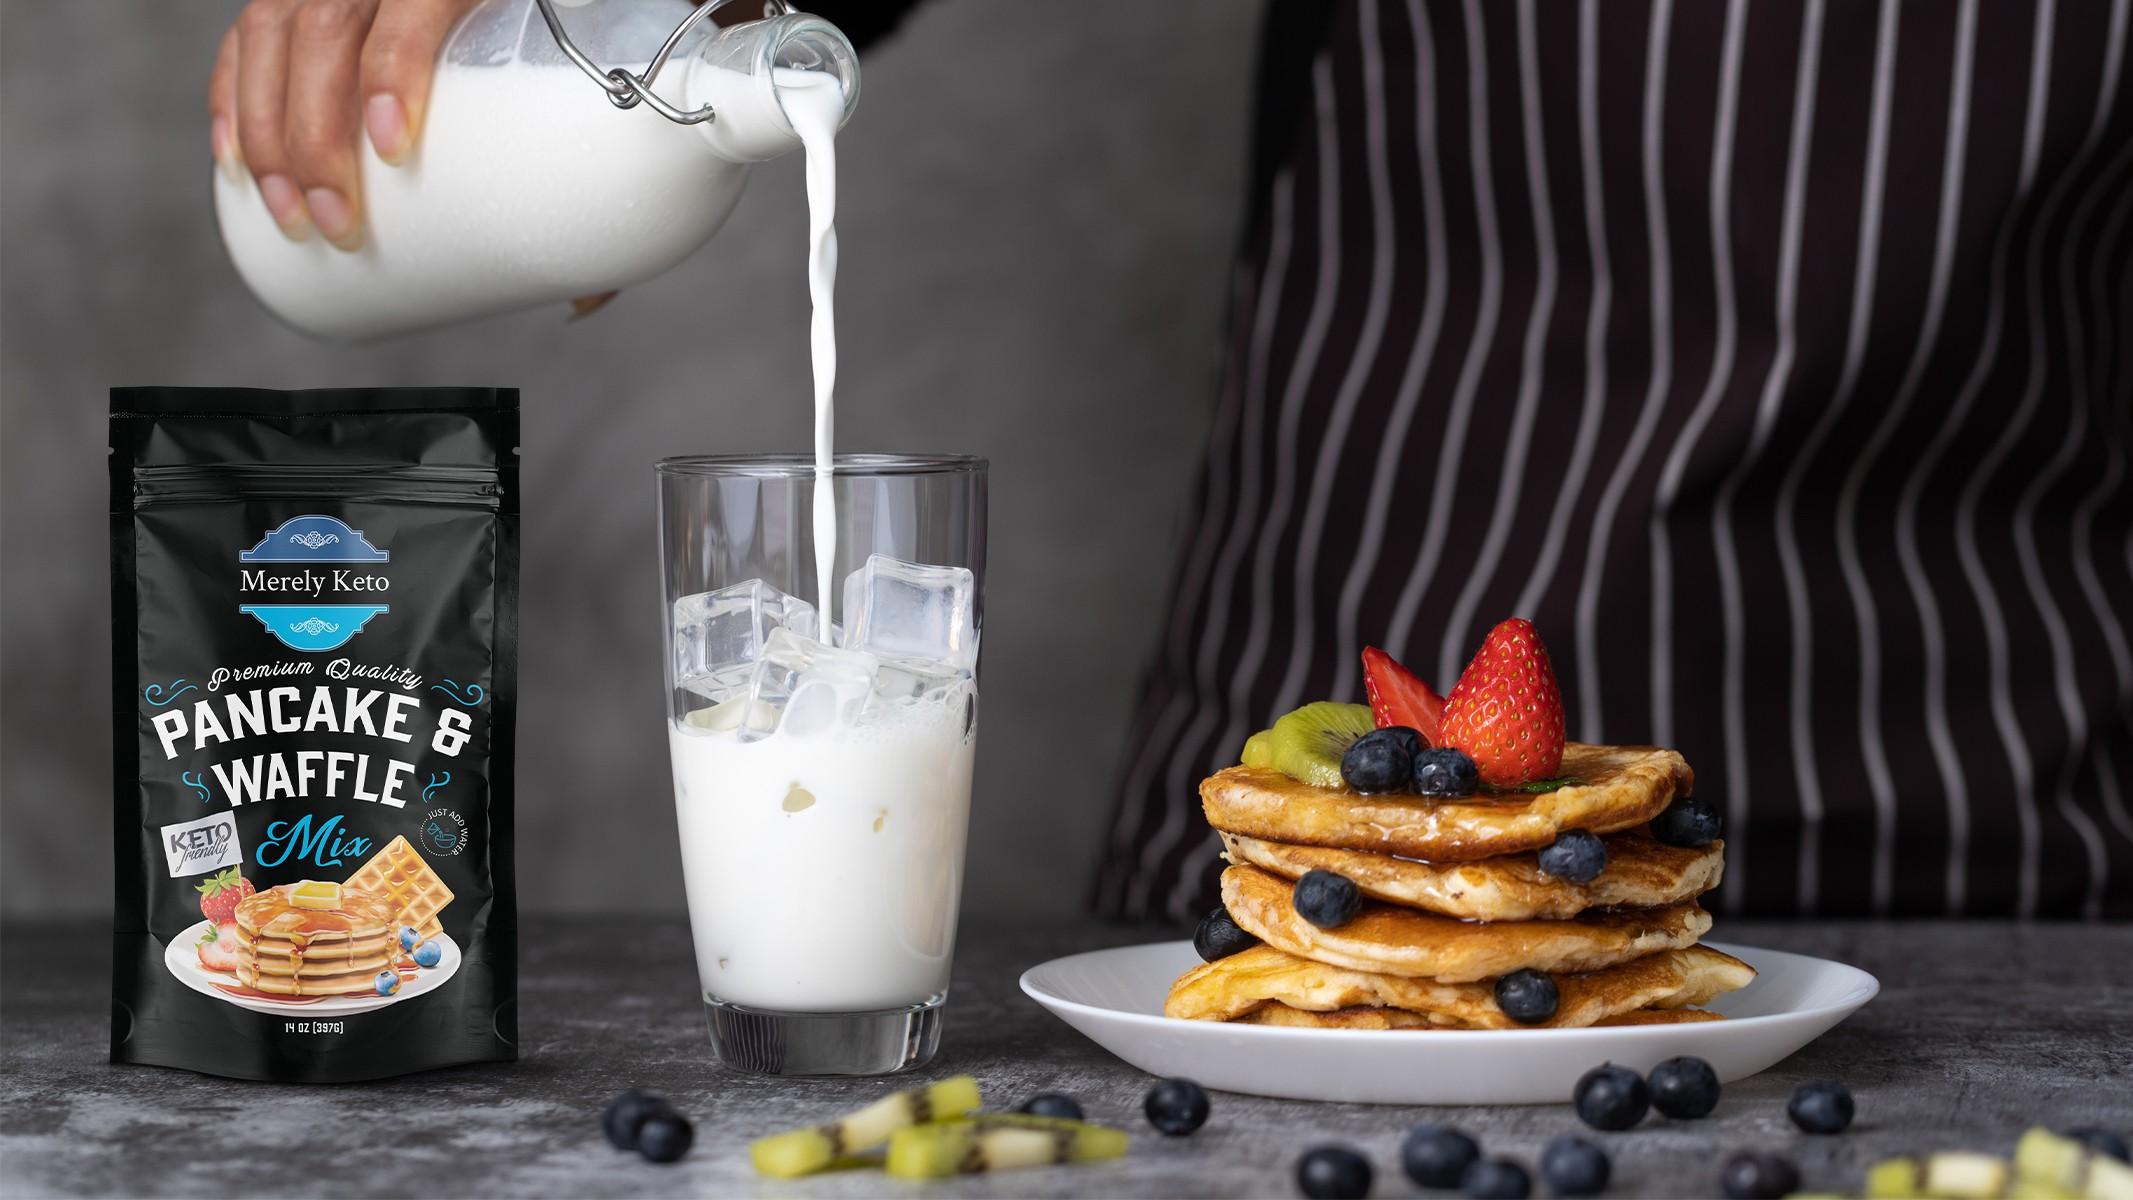 Merely Keto Pancake and Waffle Mix Kickstarter Artwork